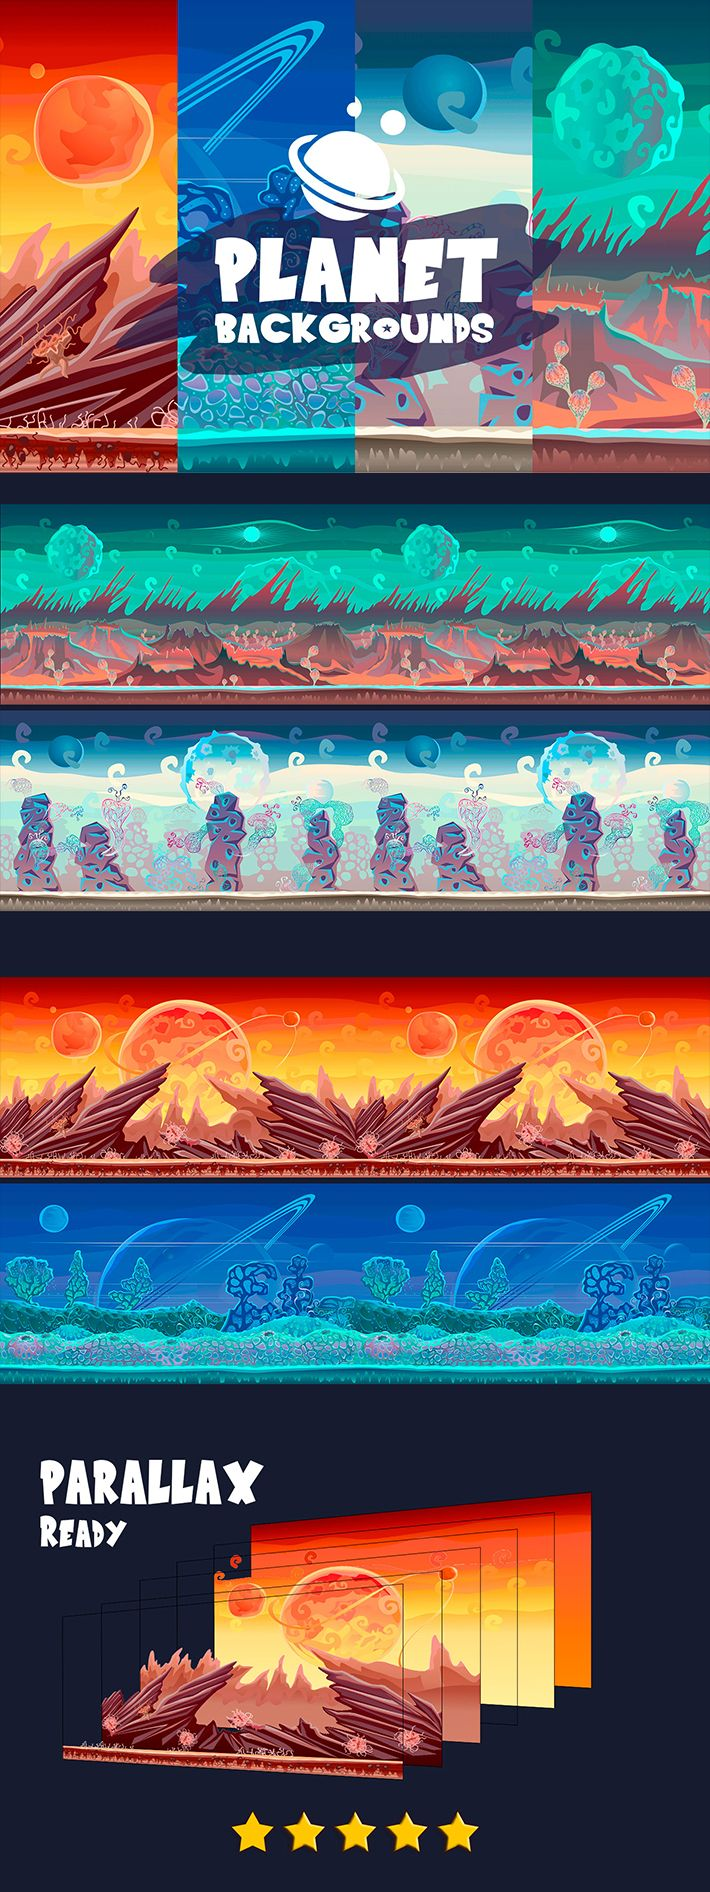 2D Game Backgrounds в 2020 г.